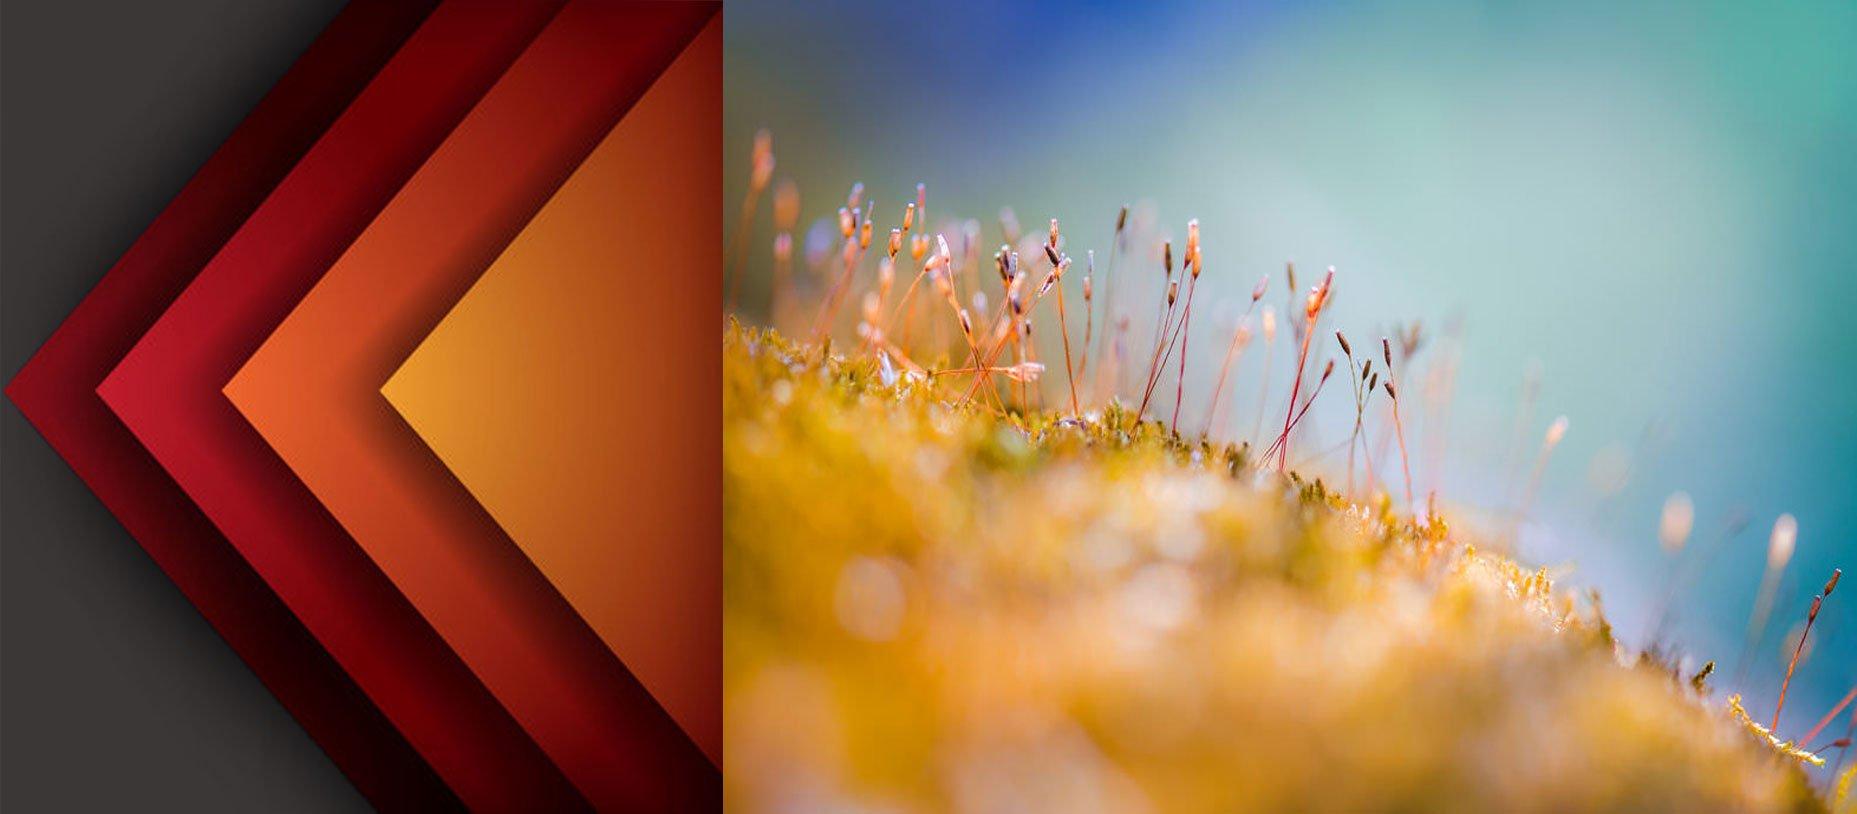 Abstract  Photography12jpg - 35 ایده و راهنما برای عکاسی انتراعی